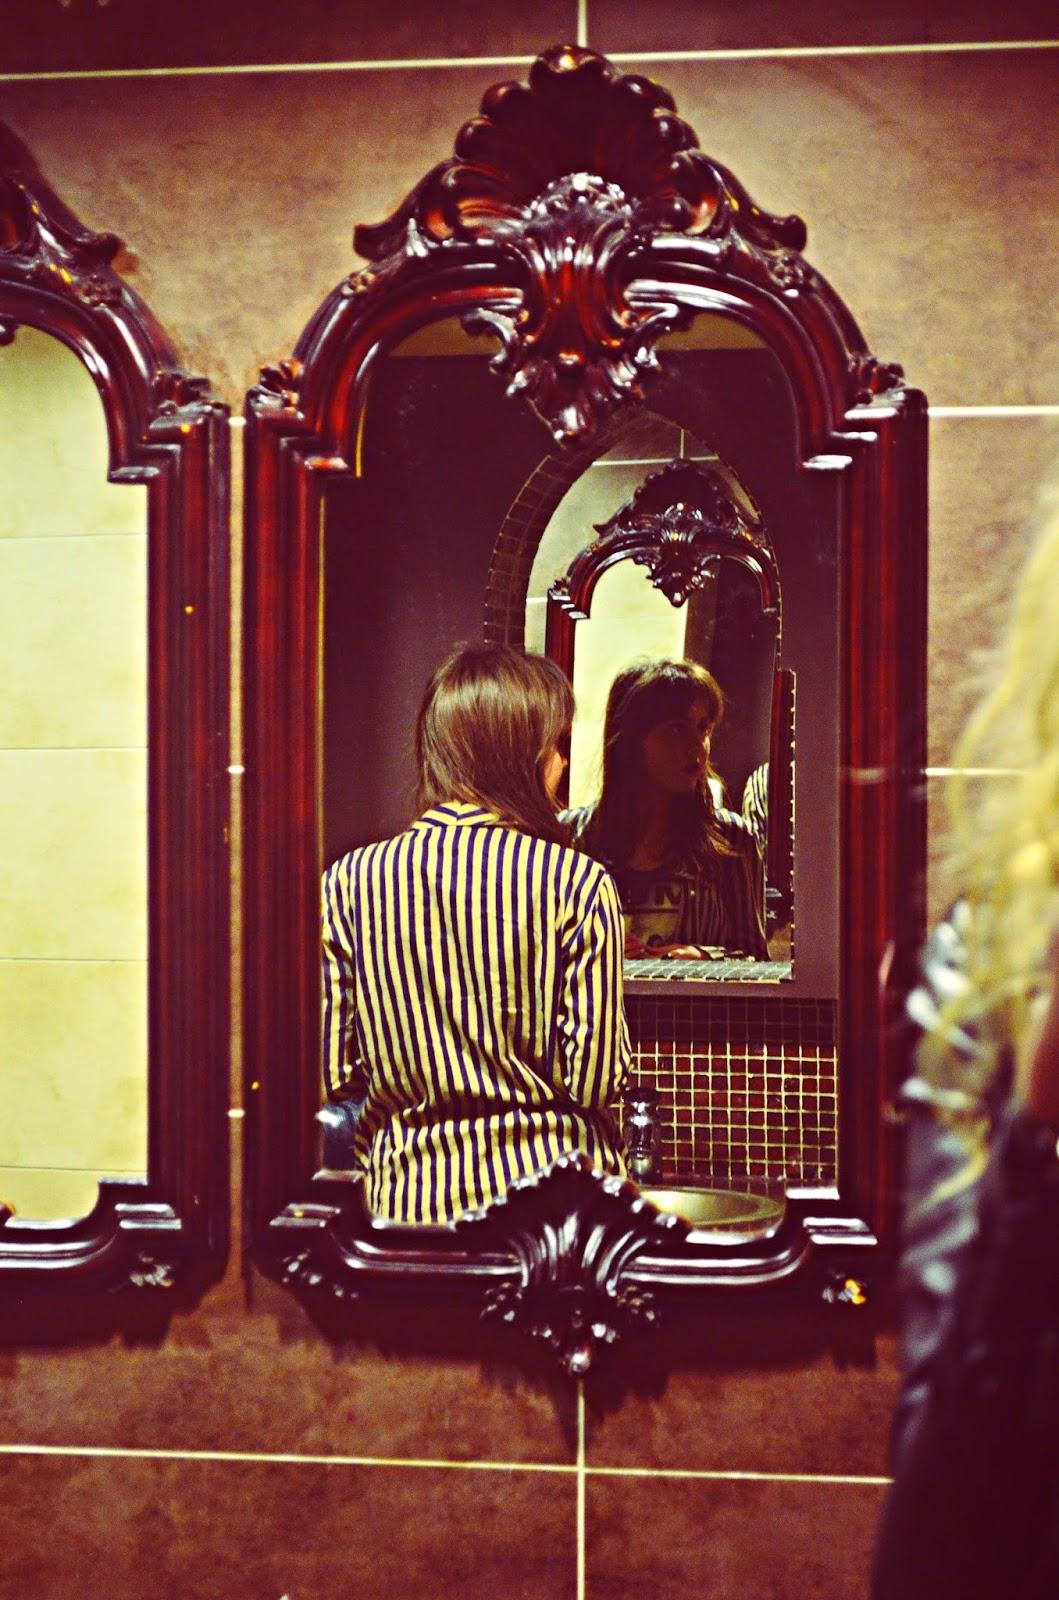 Stephi, stephi lareine, lareine, fashion, fashion blog, fashion blogger, uk fashion blogger, beauty blogger, beauty blog, uk beauty blog, life style blog, lifestyle blogger, uk lifestyle blog, northwest uk, photographer, graphic designer, motel, motelrocks, missguided, ax paris, topshop, urban outfitters, new look, primark, lfw, Liverpool, portrait fashion, lookbook, tumblr, pinterest, twitter, facebook, bloglovin, pastel hair, vintage, diy, nail art, ootd, stephi photography, mirror fashion, brown mirror, kimo's liverpool,